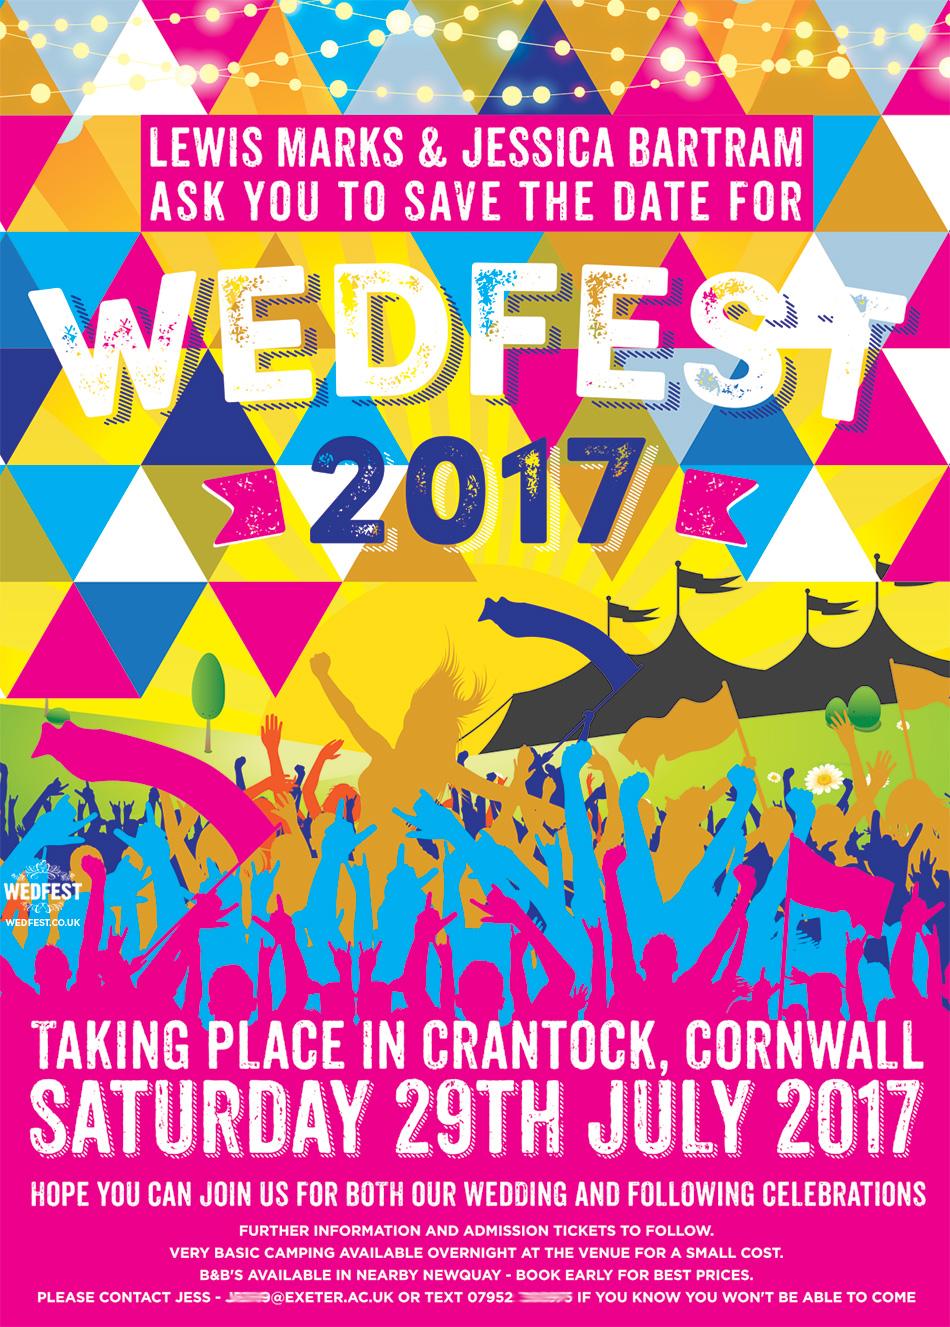 wedfest triangle geometric music festival wedding save the date